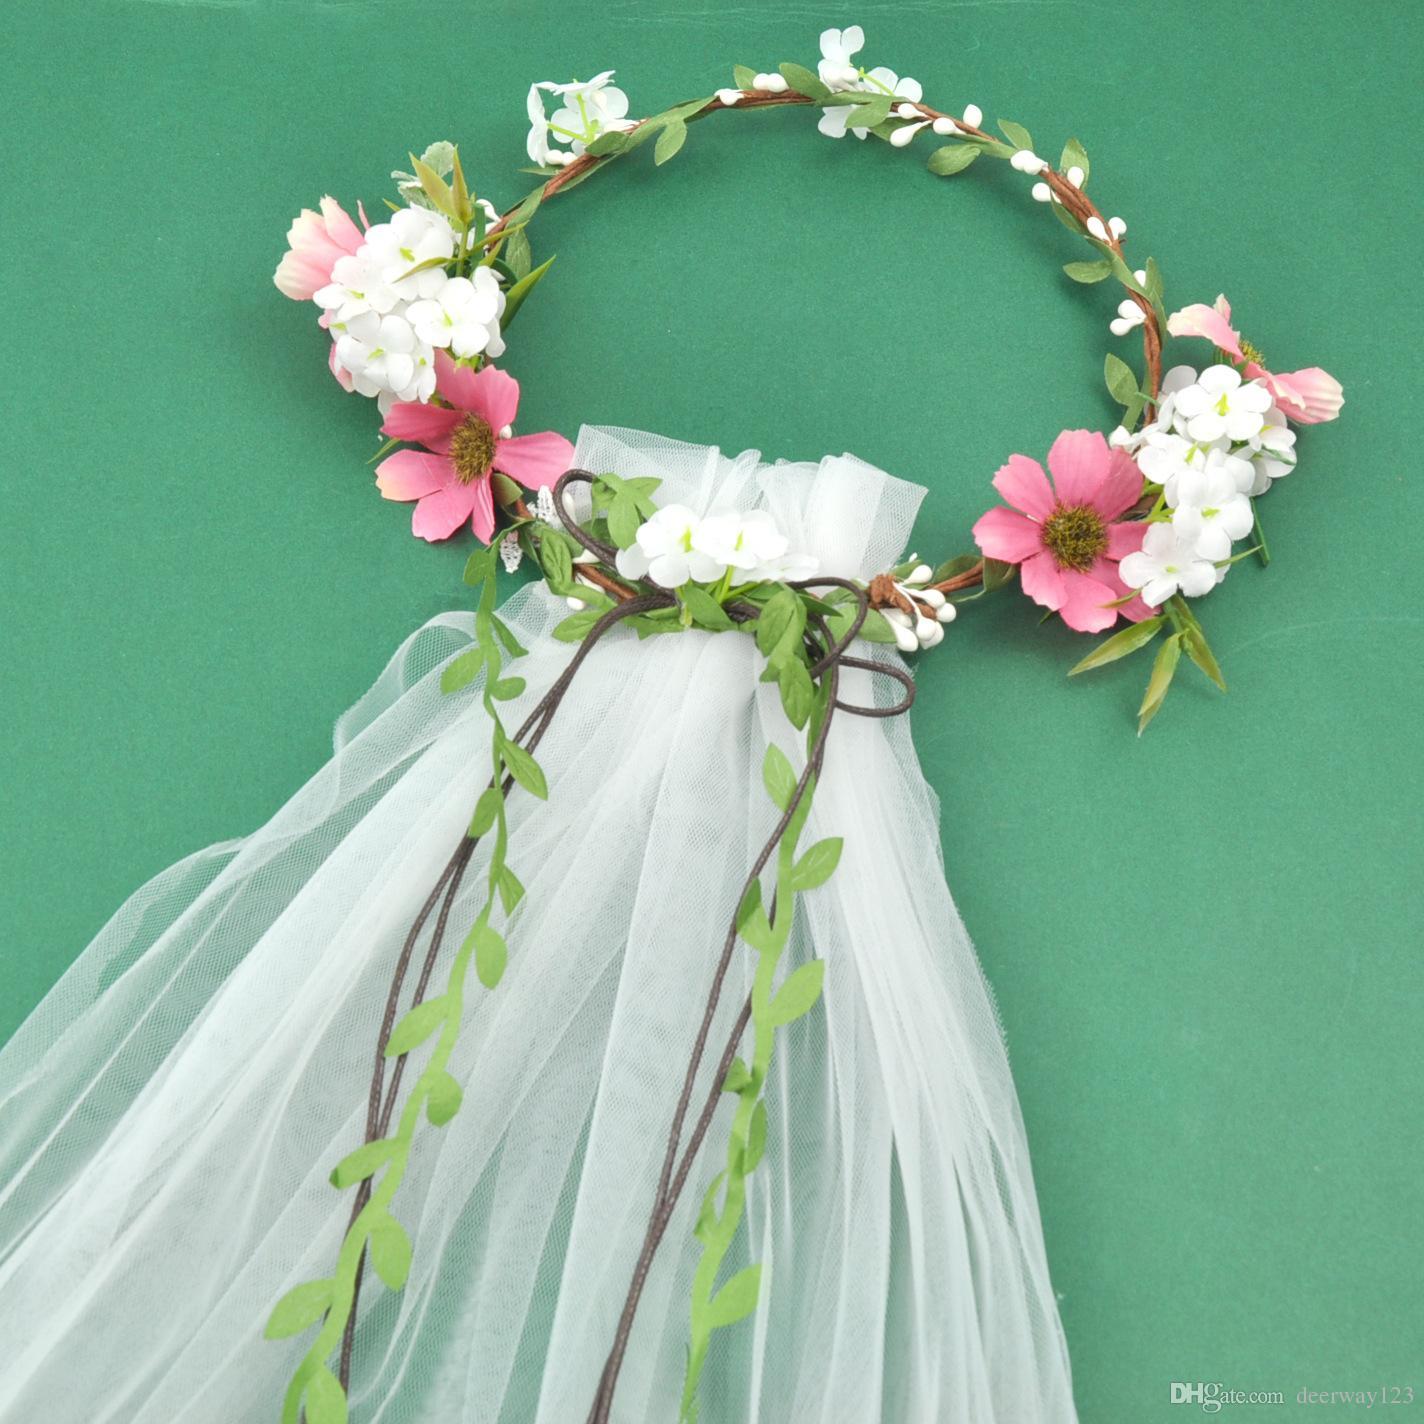 Wedding Veil Flower Crown Online Shopping Wedding Veil Flower